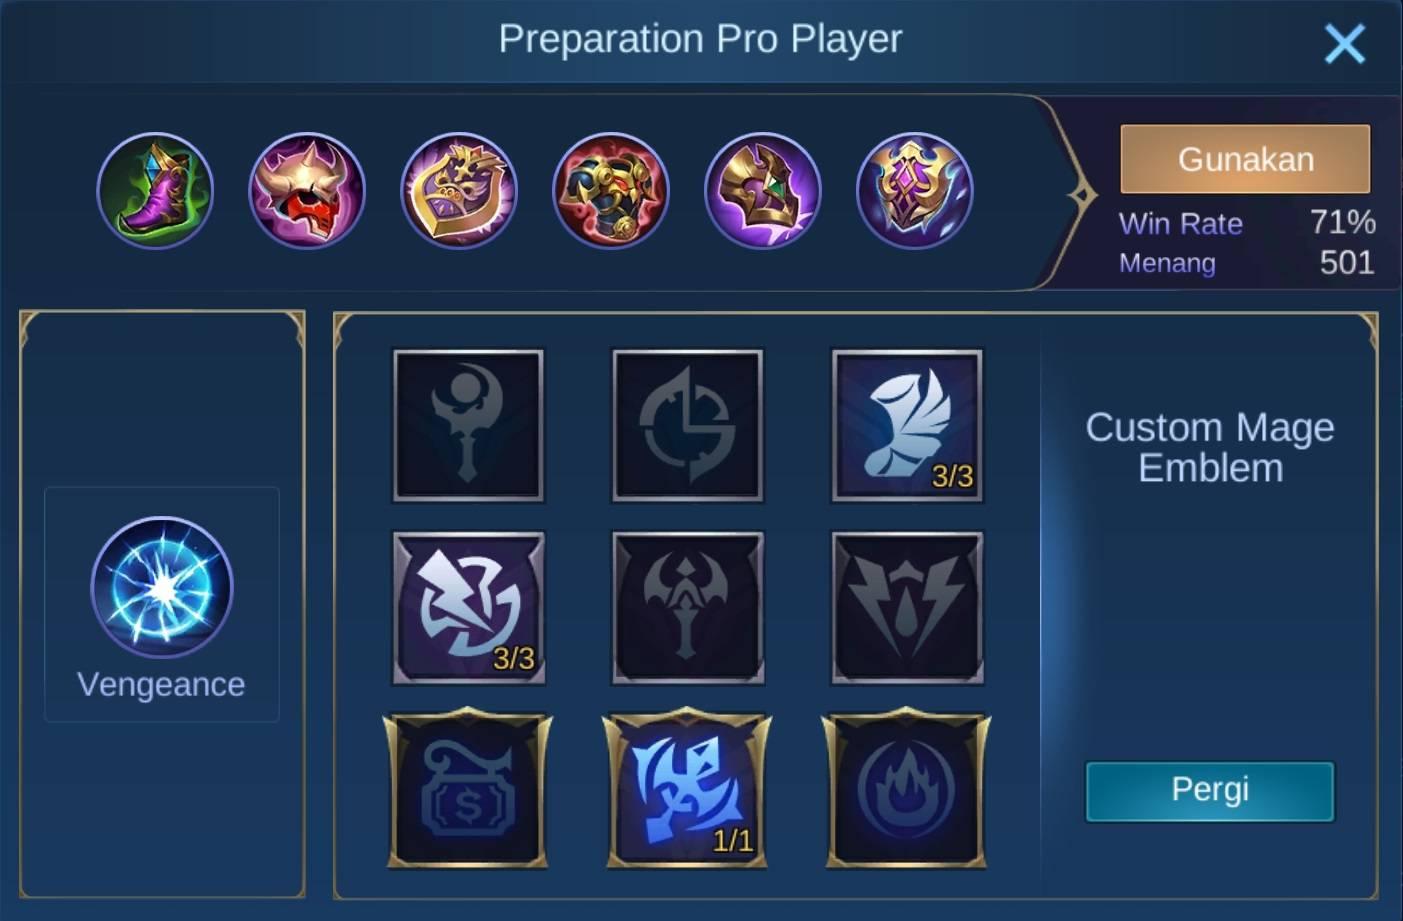 Build item carmila mobile legends (ML)